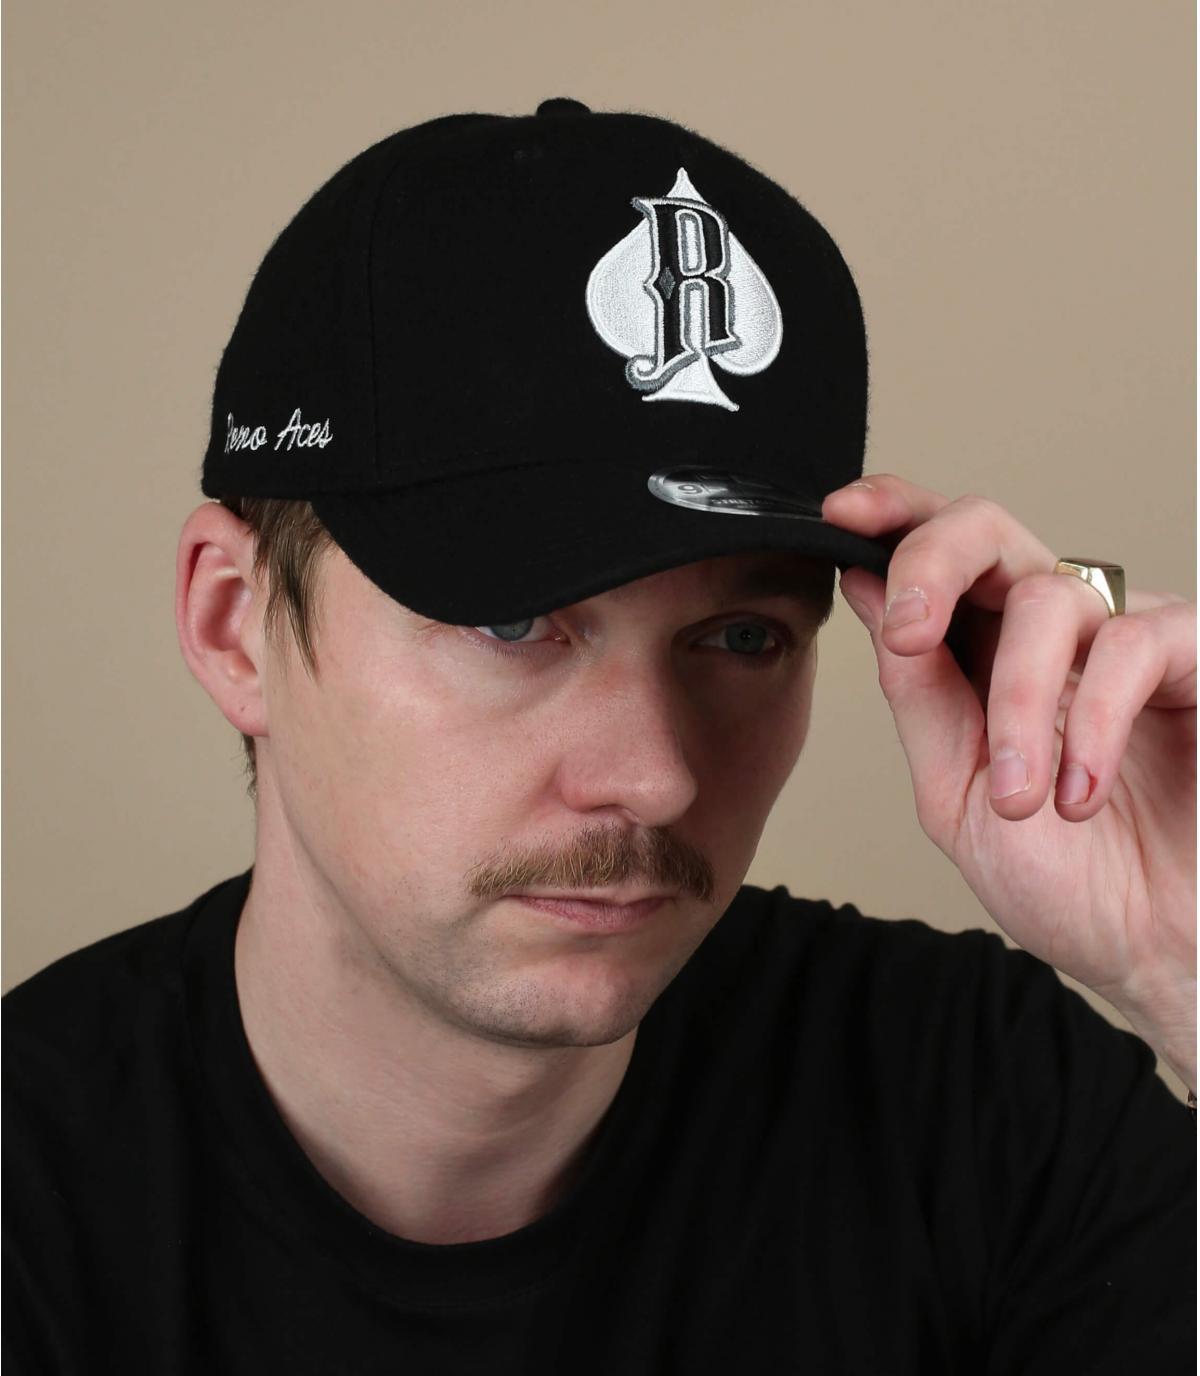 zwarte Reno Aces cap